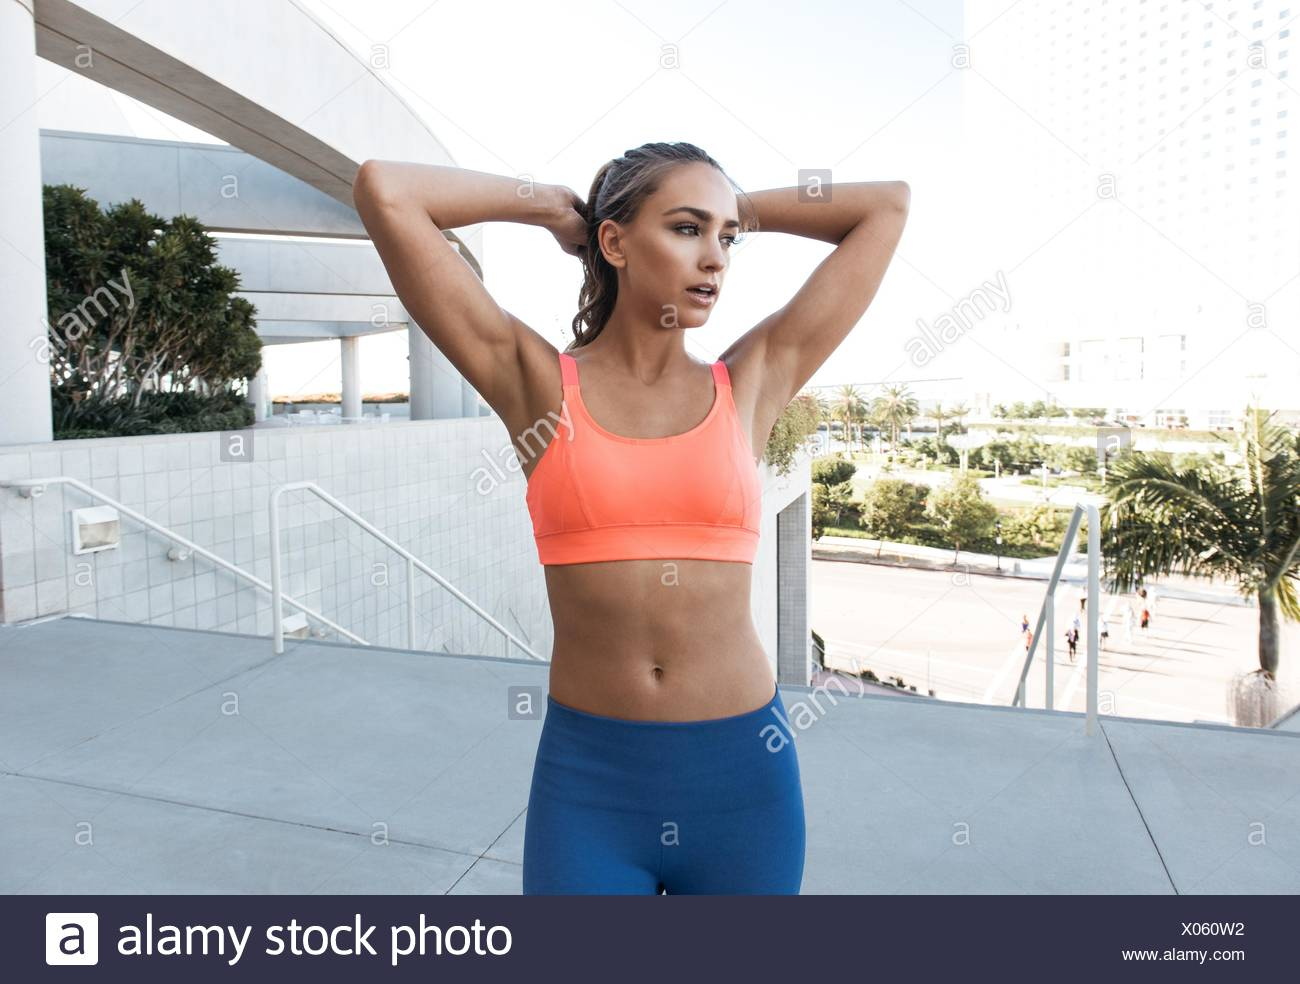 Junge Frau trägt Sport-BH, Hände hinter dem Kopf, wegschauen Stockbild